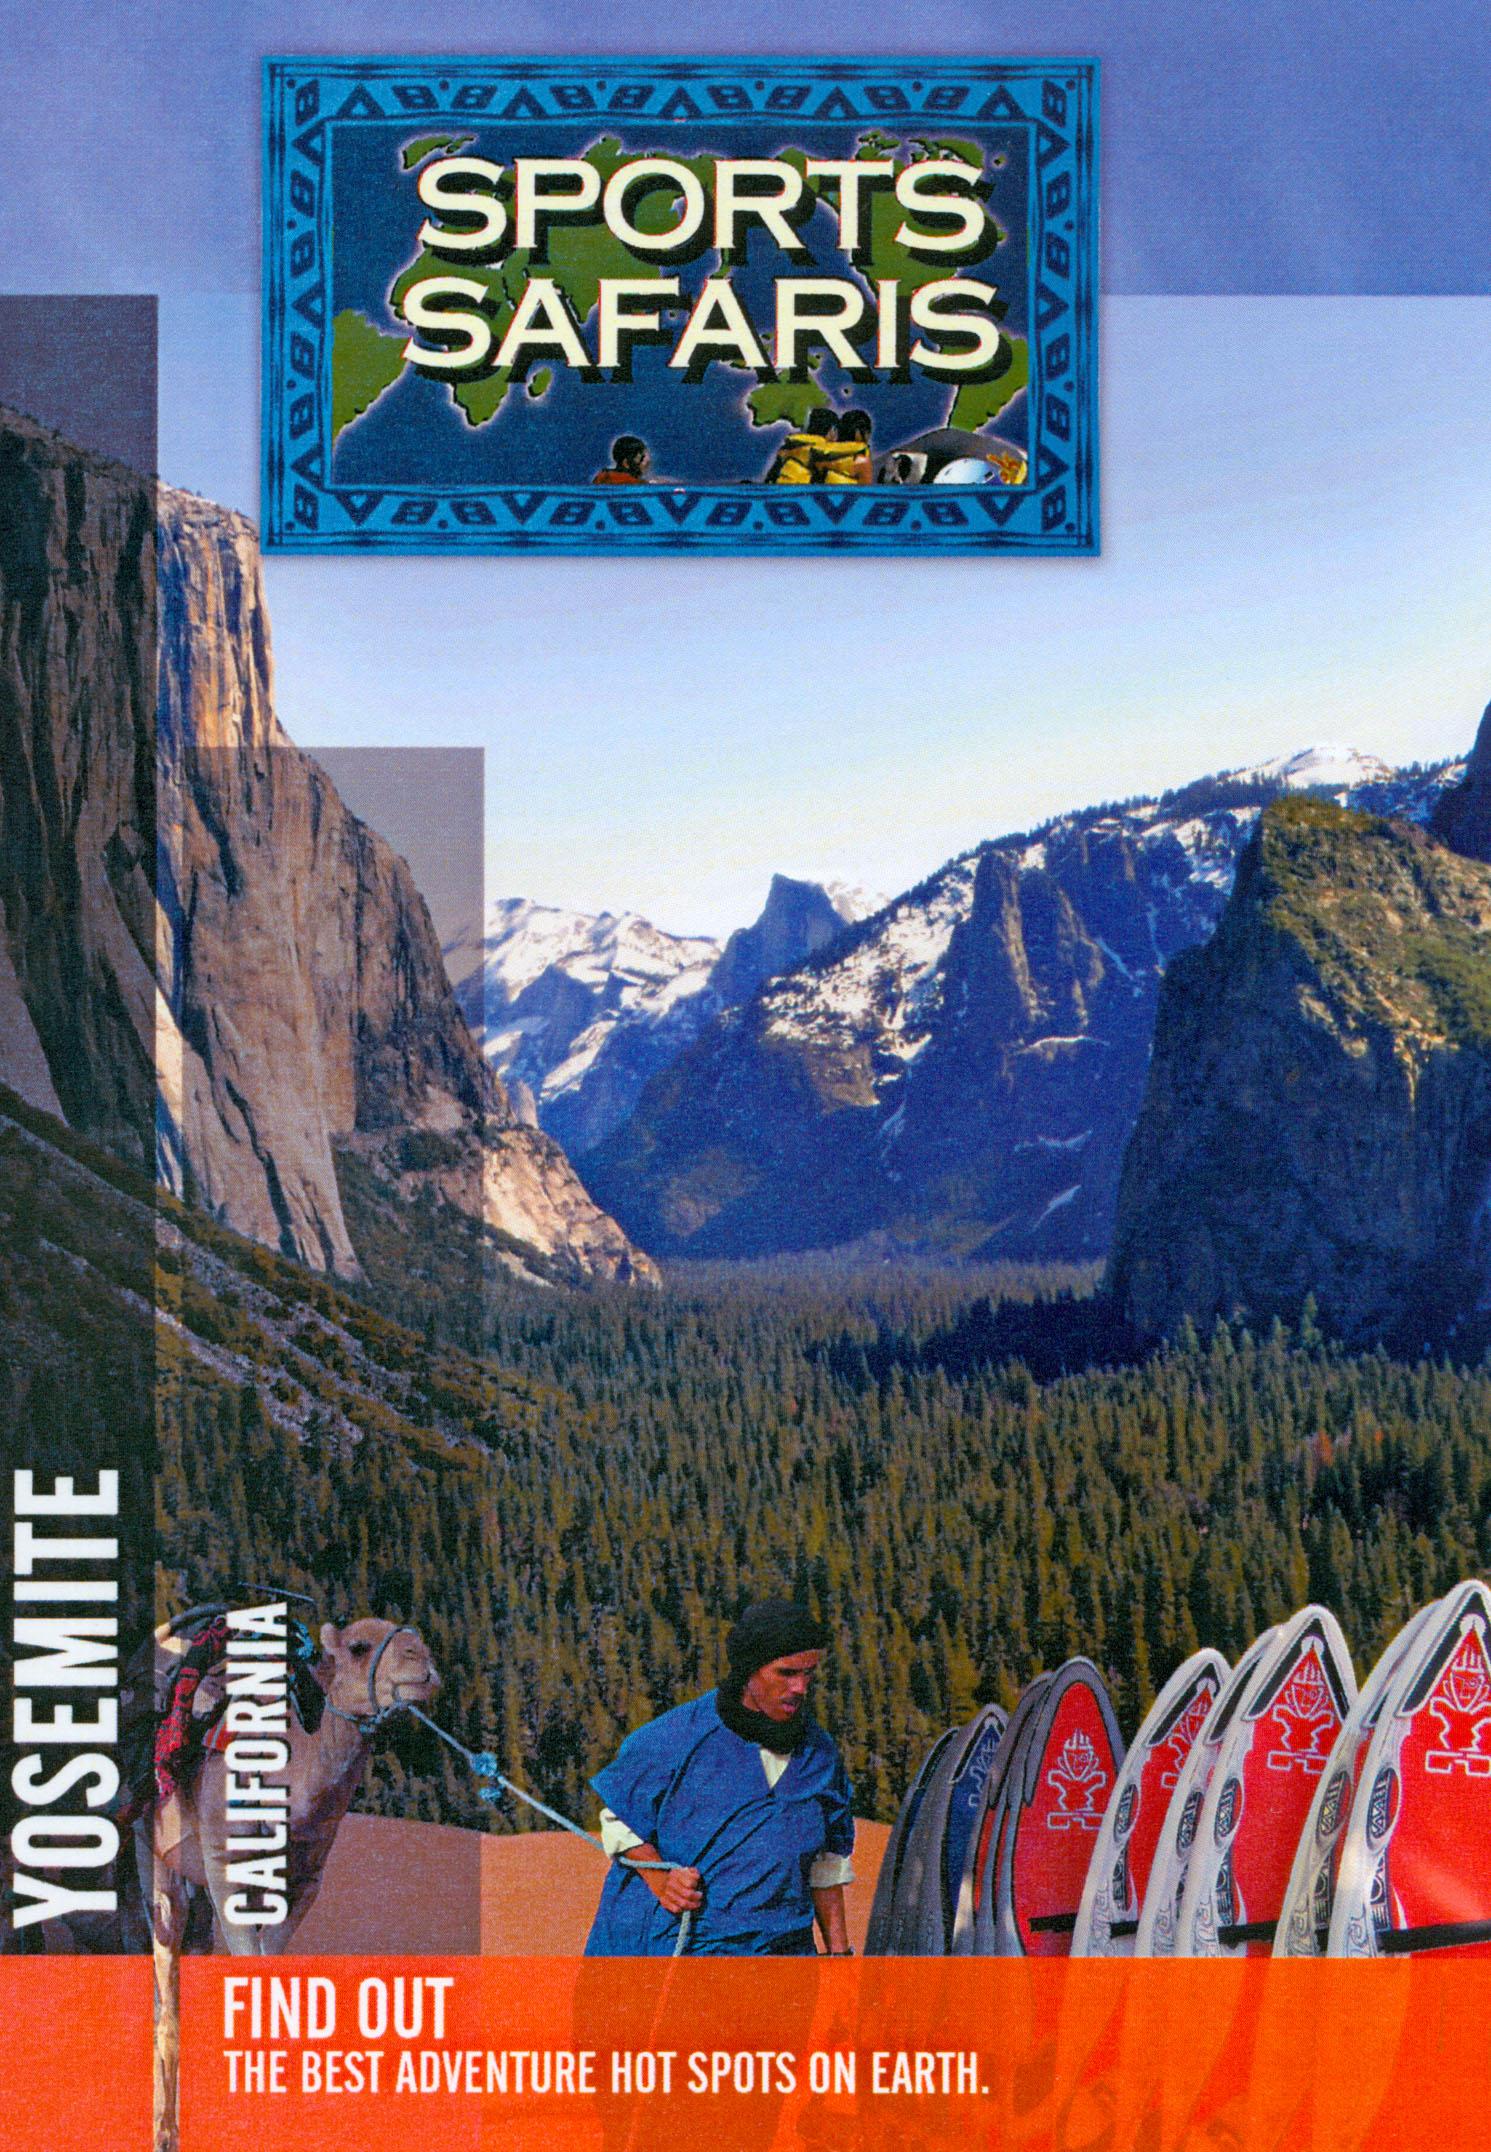 Sports Safaris: Yosemite - California